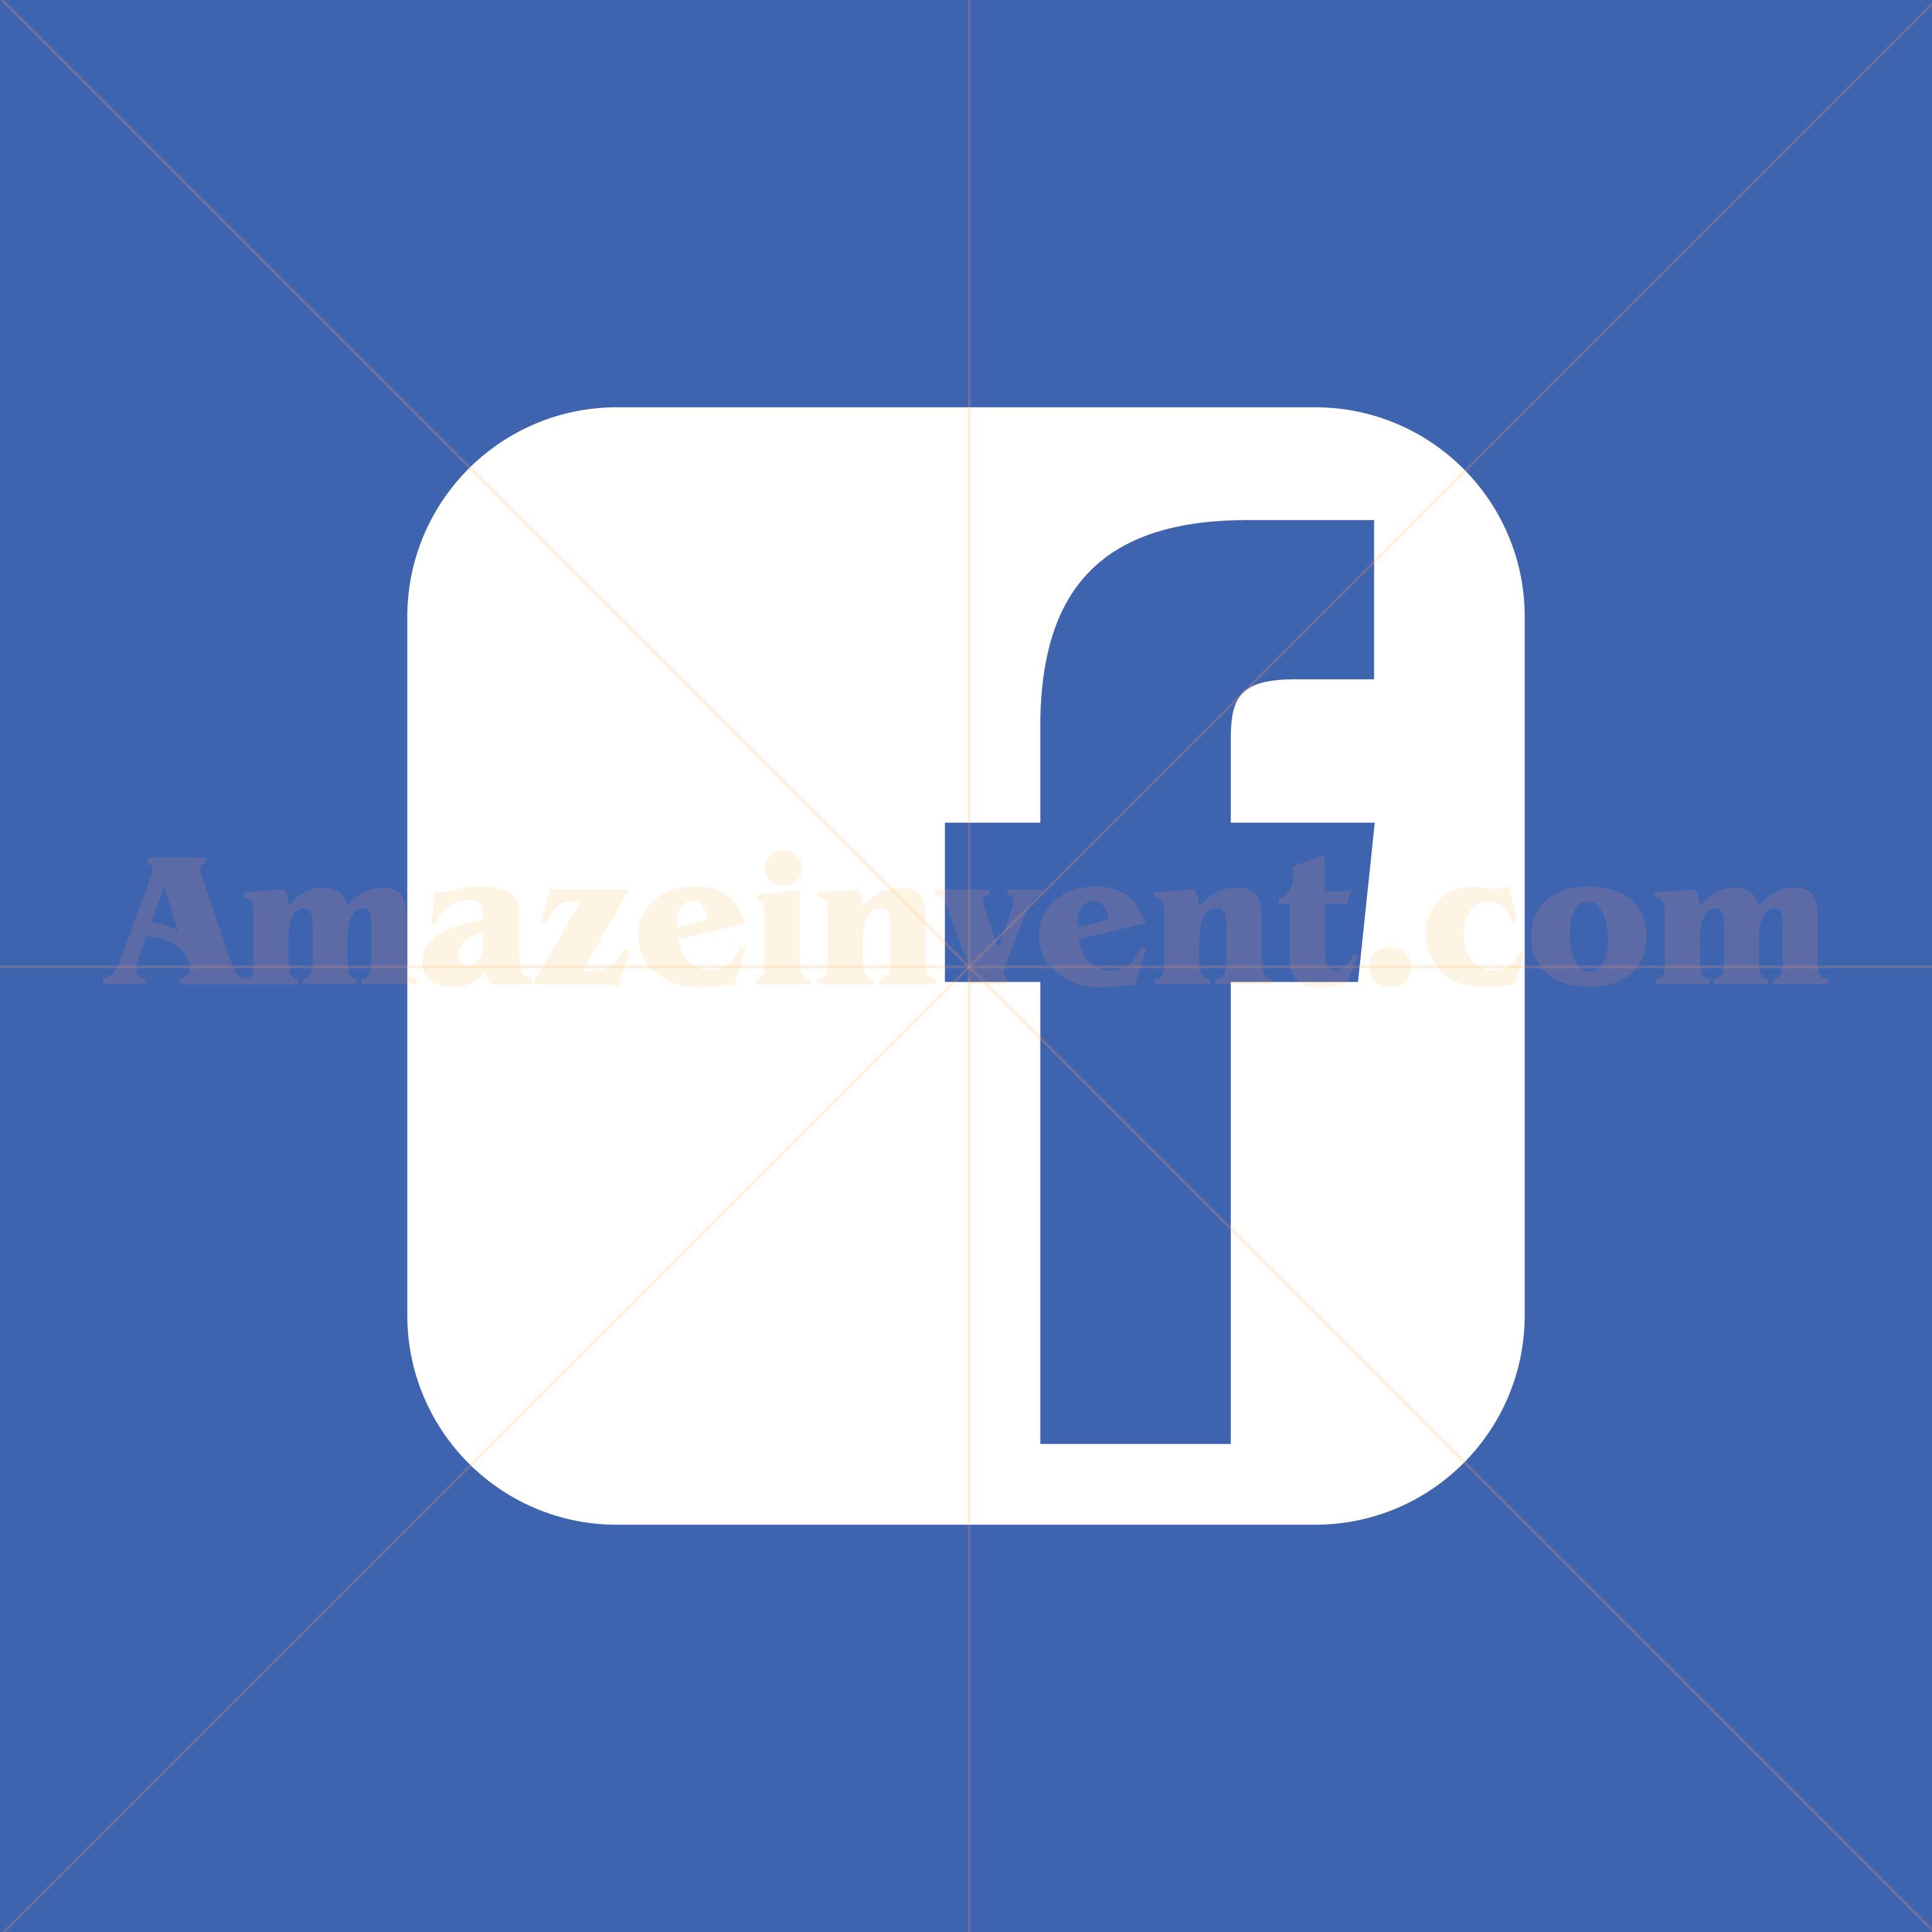 Social Media Sites in 2019 Facebook